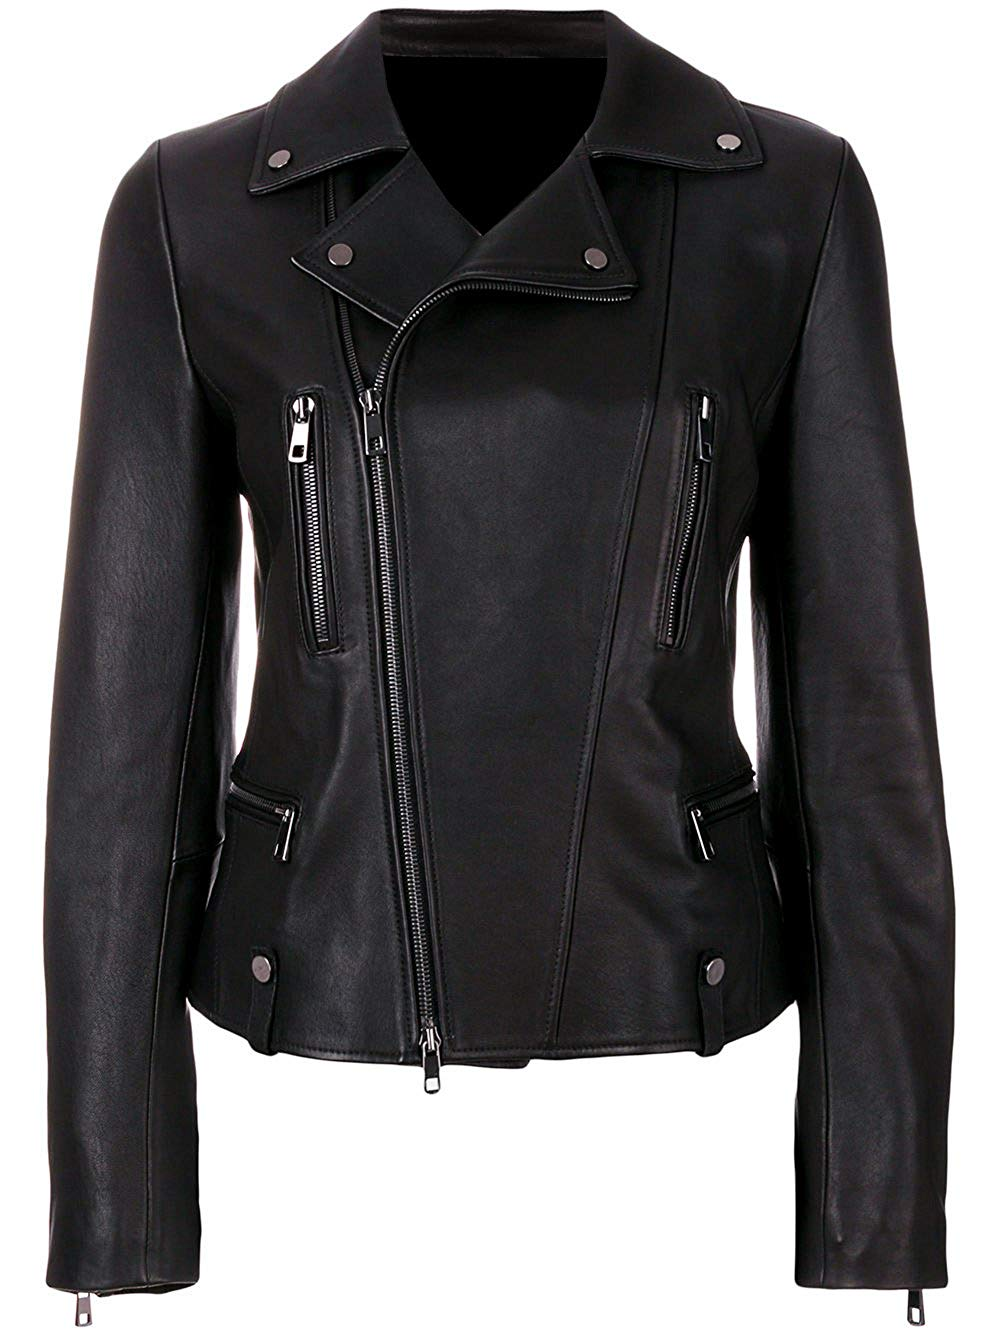 VearFit Arebzona Black PU Biker Motorcycle Leather Jacket for Women Missy Regular & Plus Size